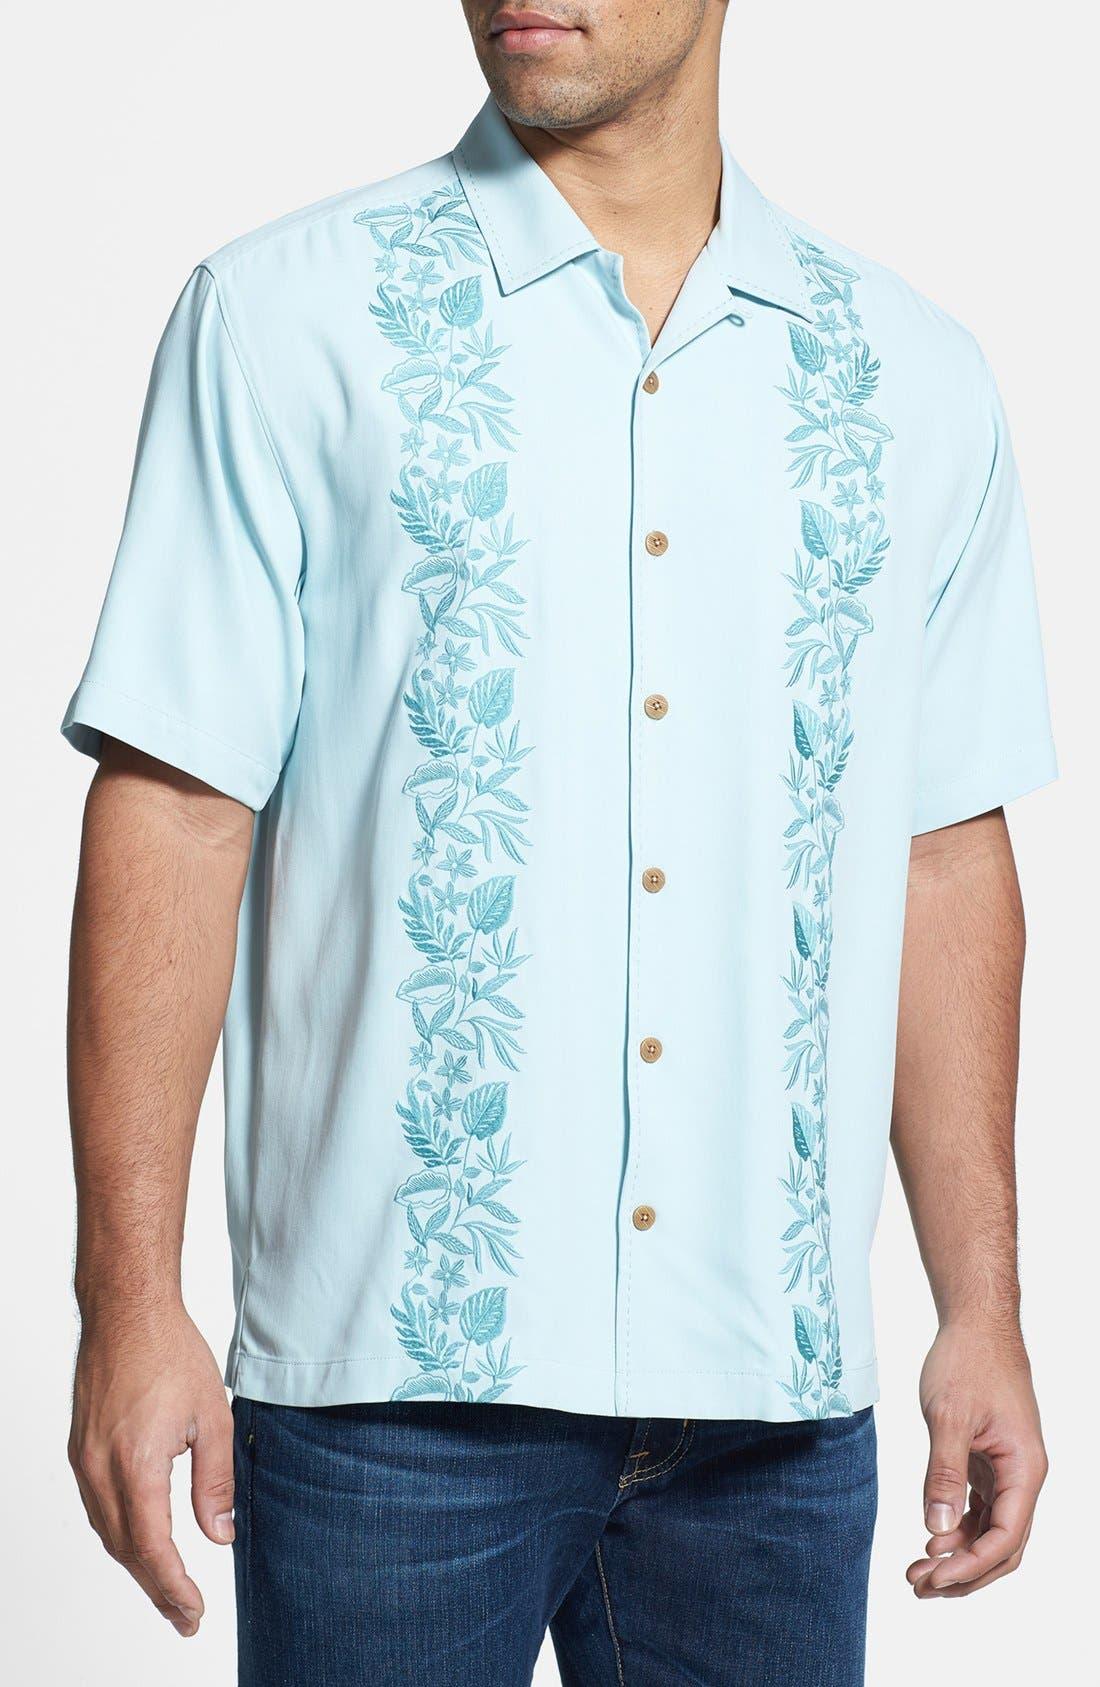 Main Image - Tommy Bahama 'Road to Havana' Regular Fit Silk Campshirt (Big & Tall)